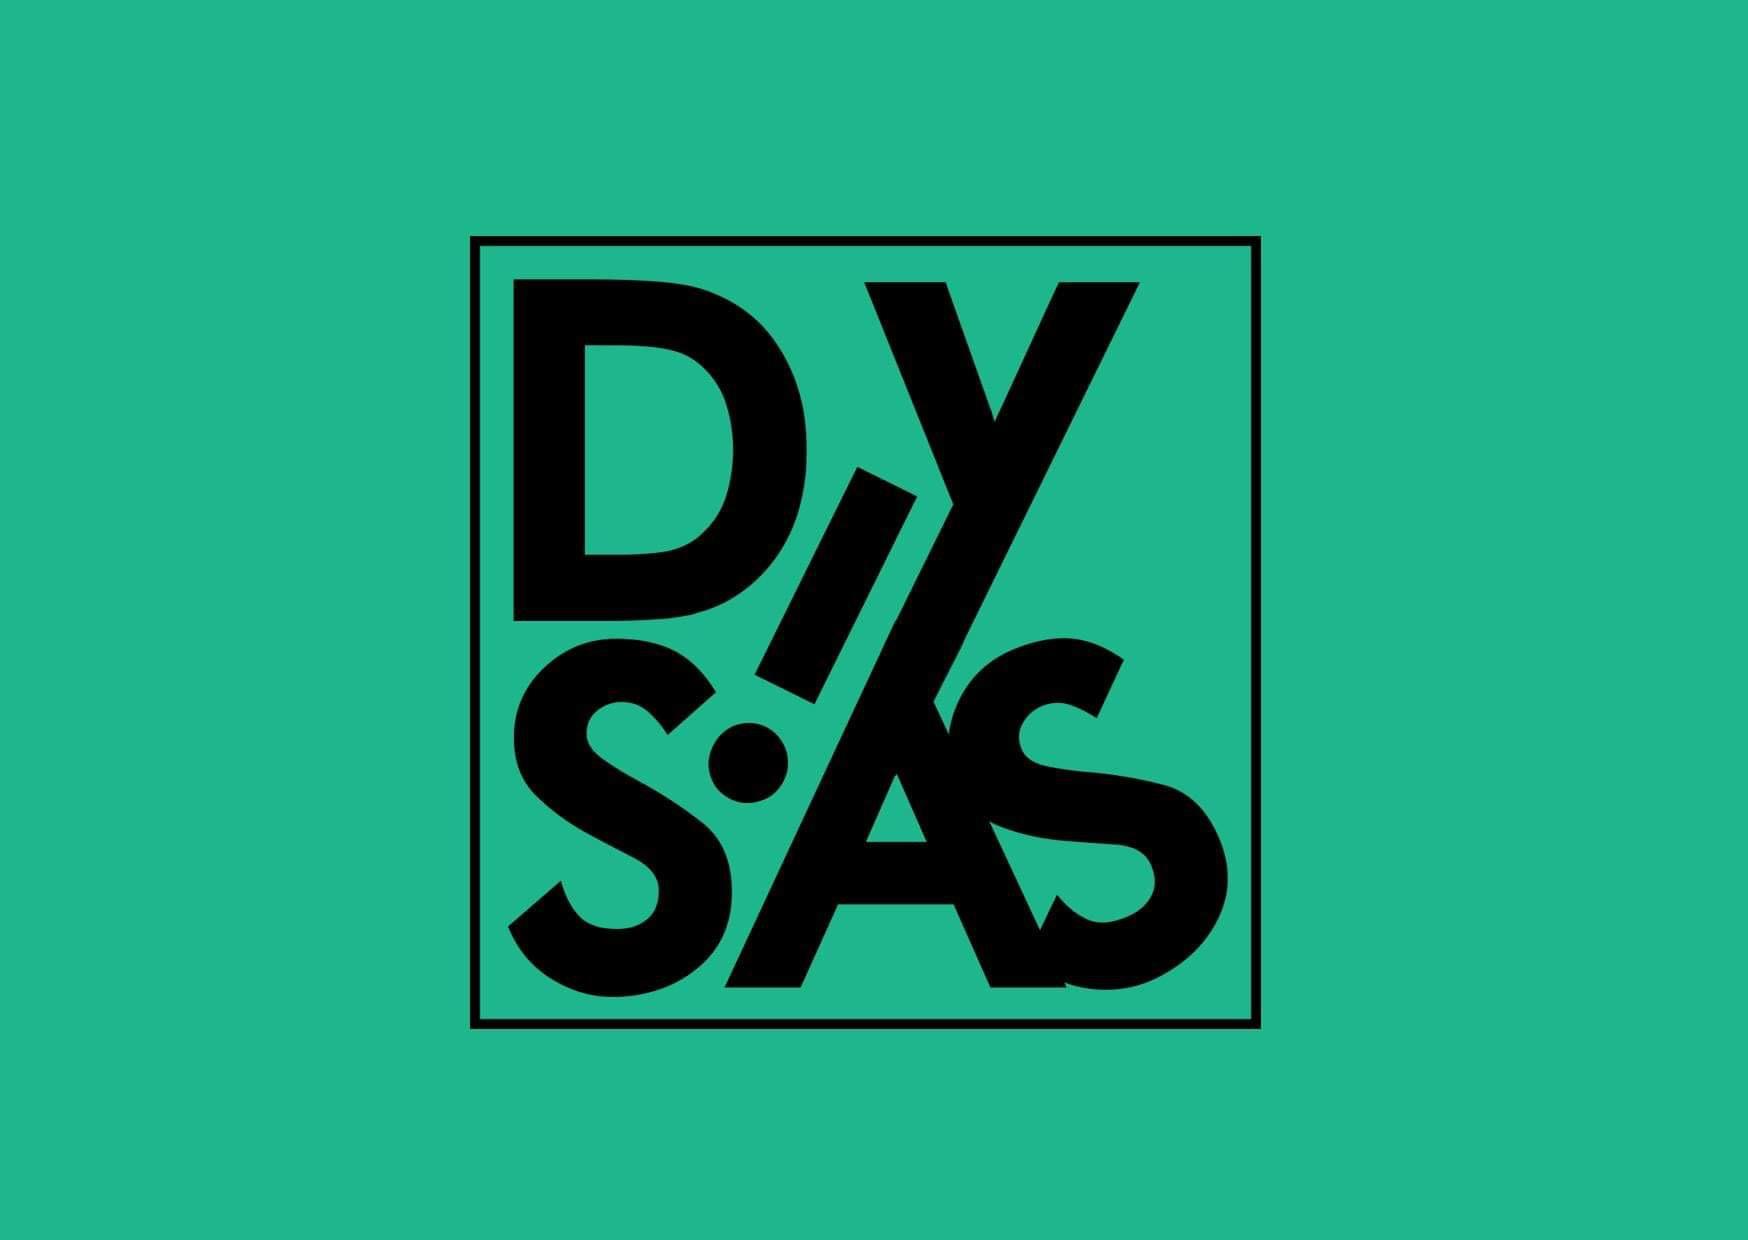 DIY SAS